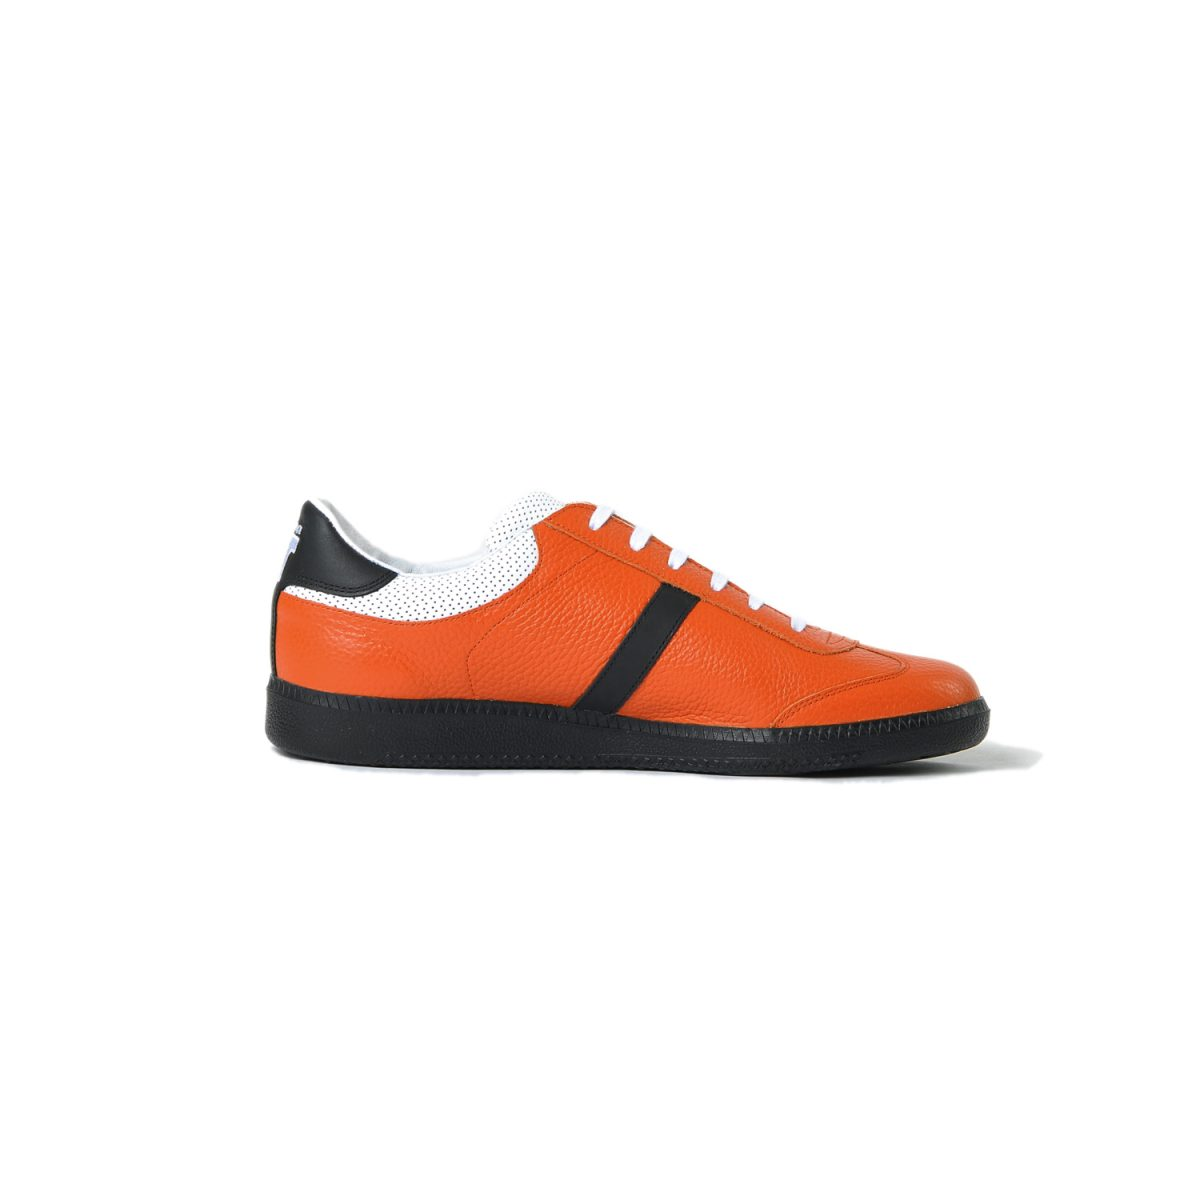 Tisza shoes - Compakt - Orange-black